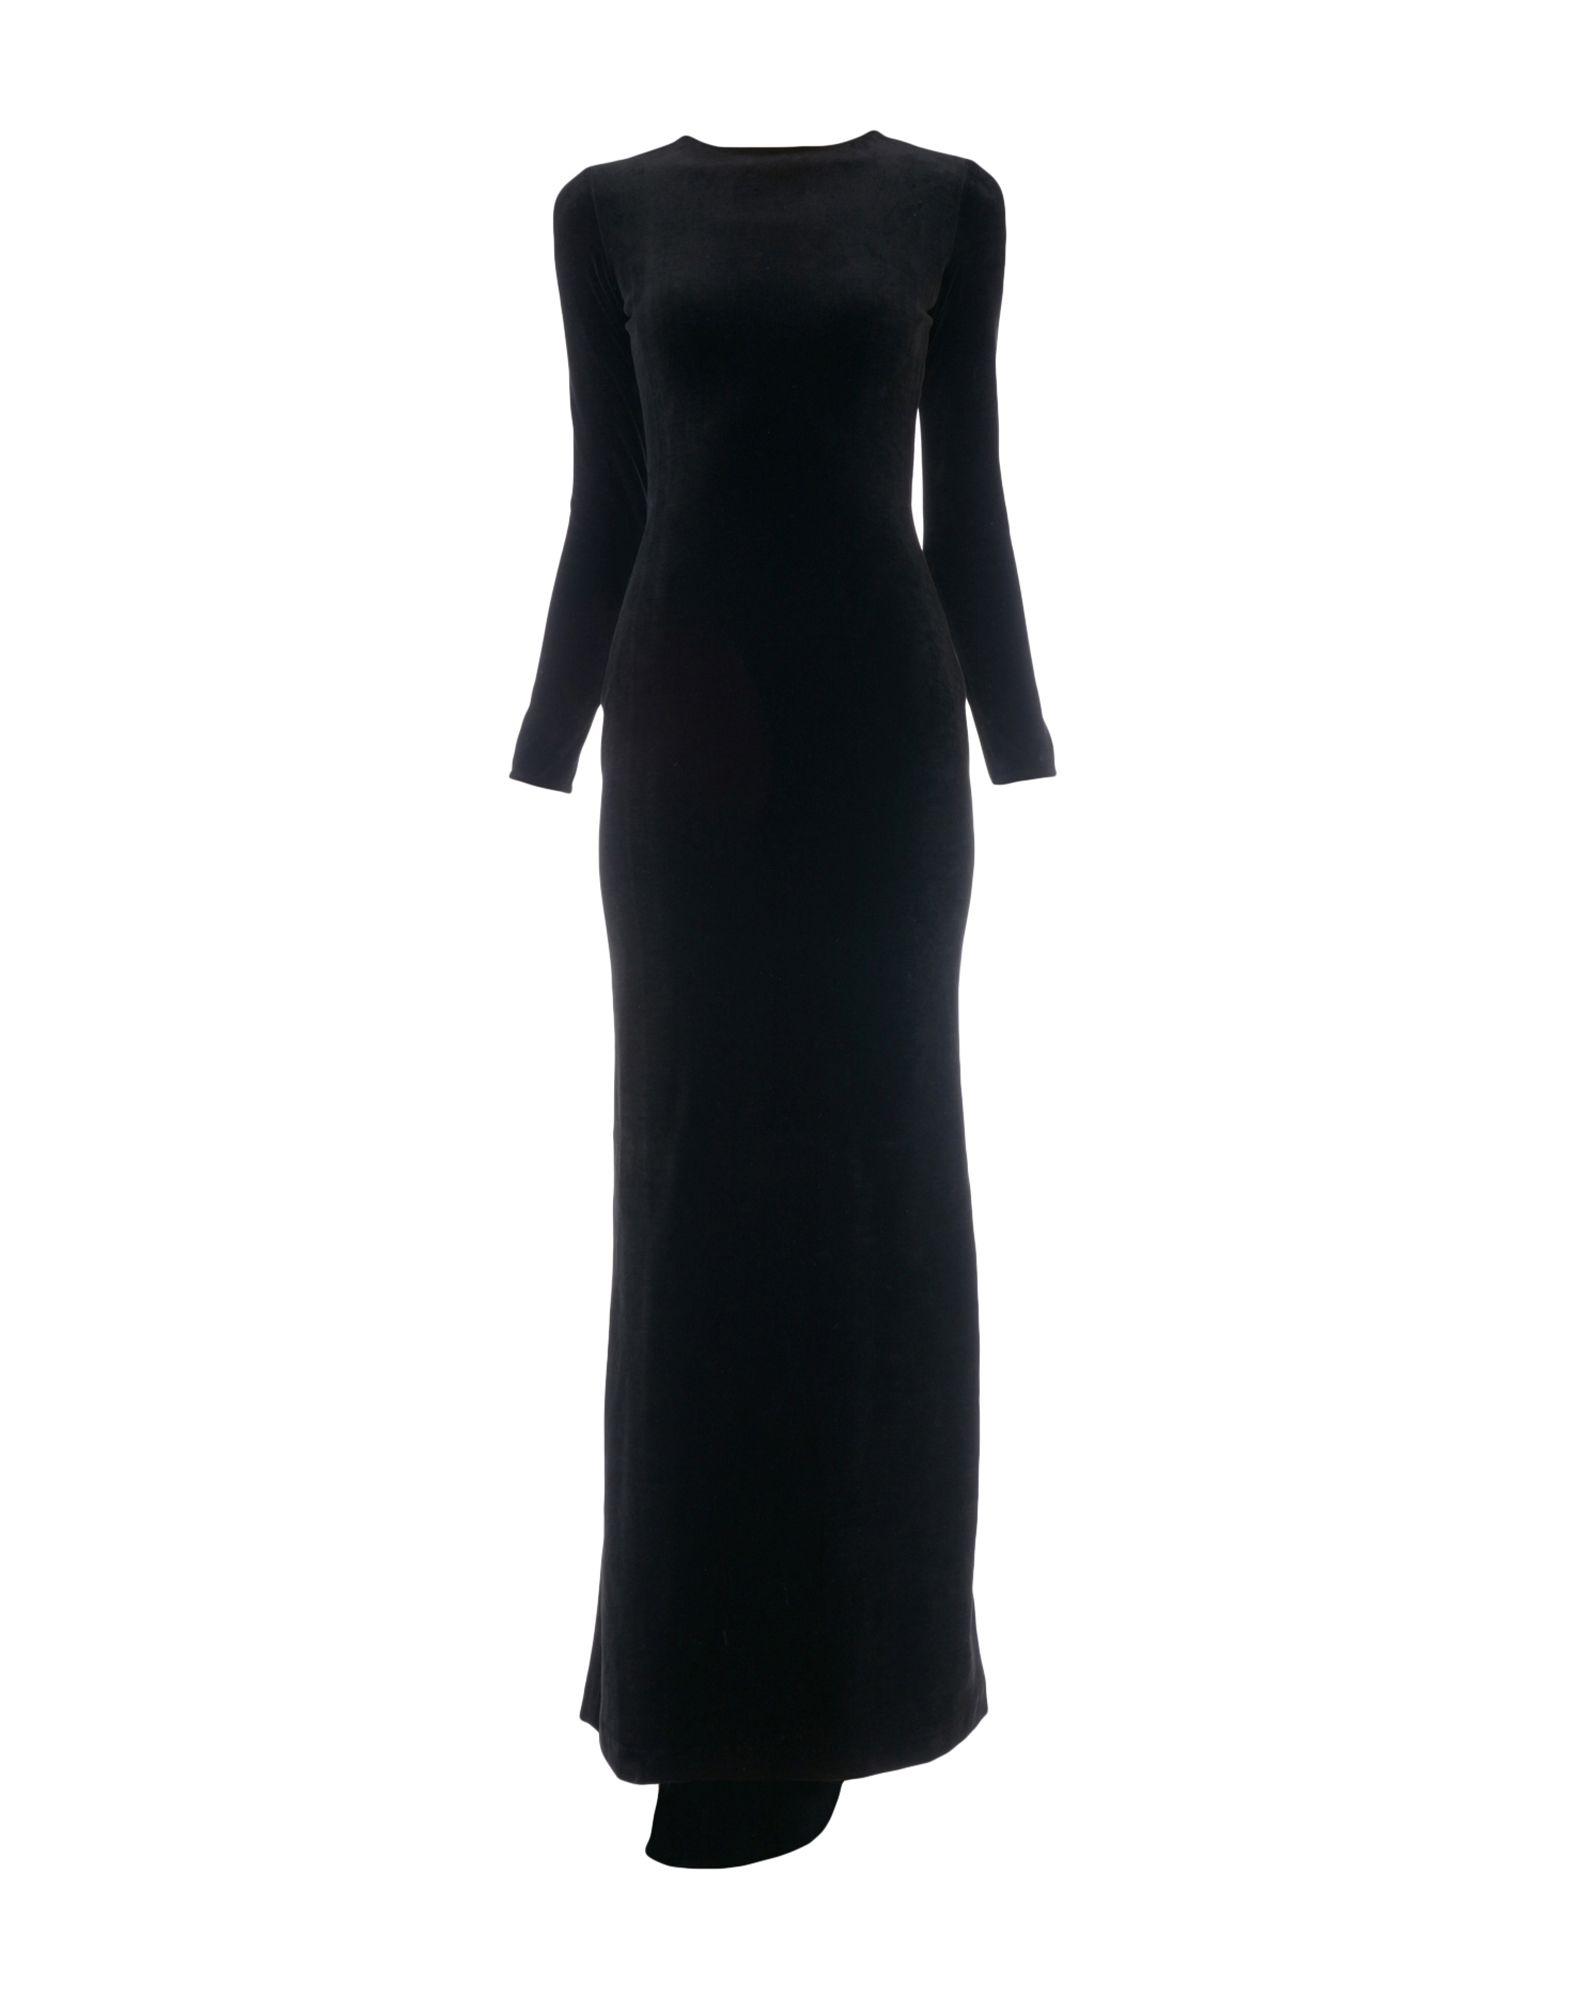 Vestito Lungo Herve' L. Leroux Donna - Acquista online su evYThwn